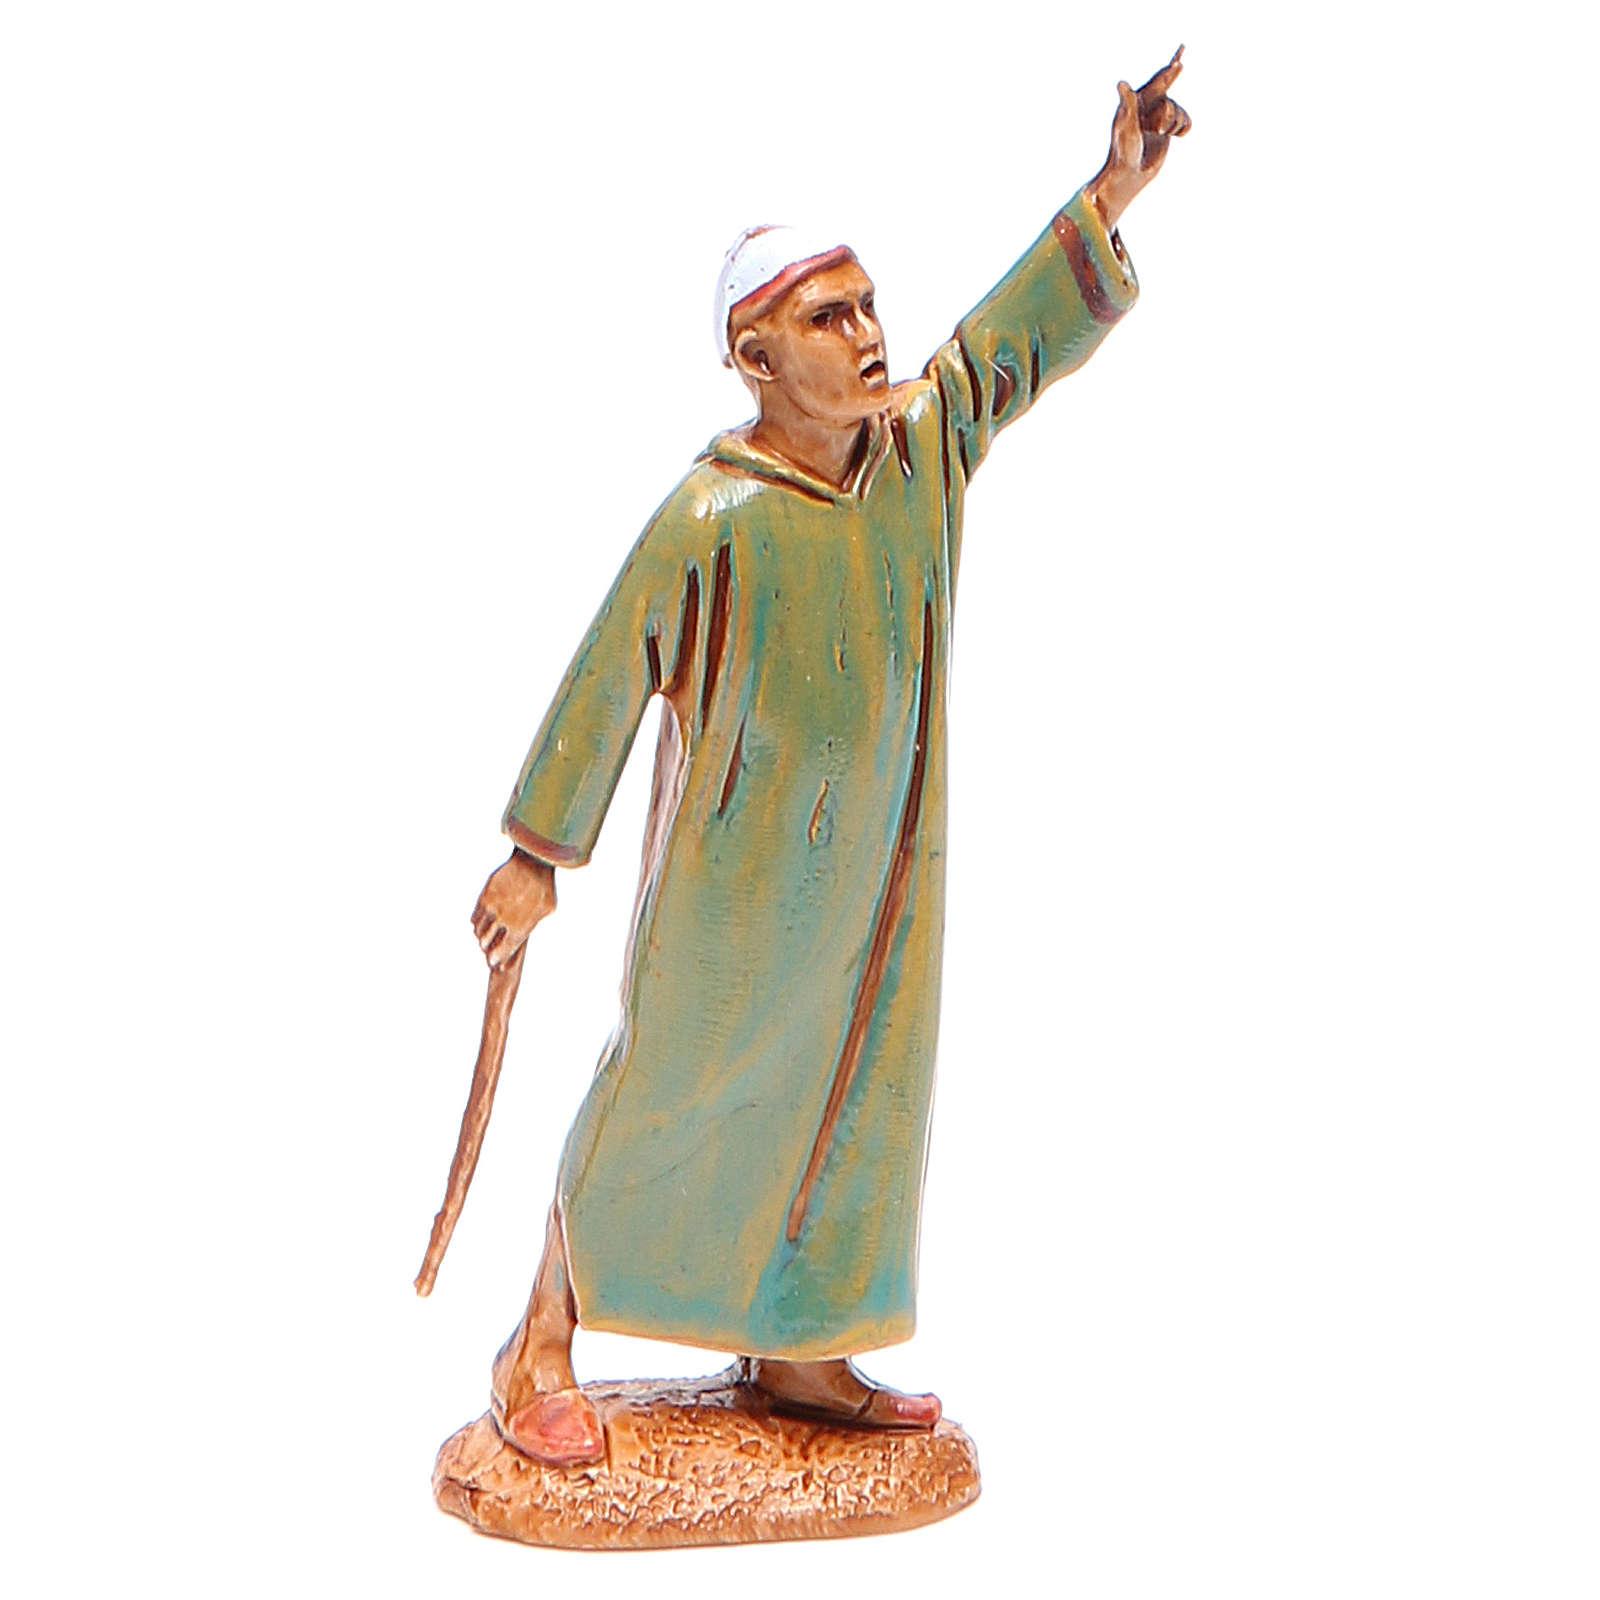 Leader 6.5cm by Moranduzzo, historic costumes 4